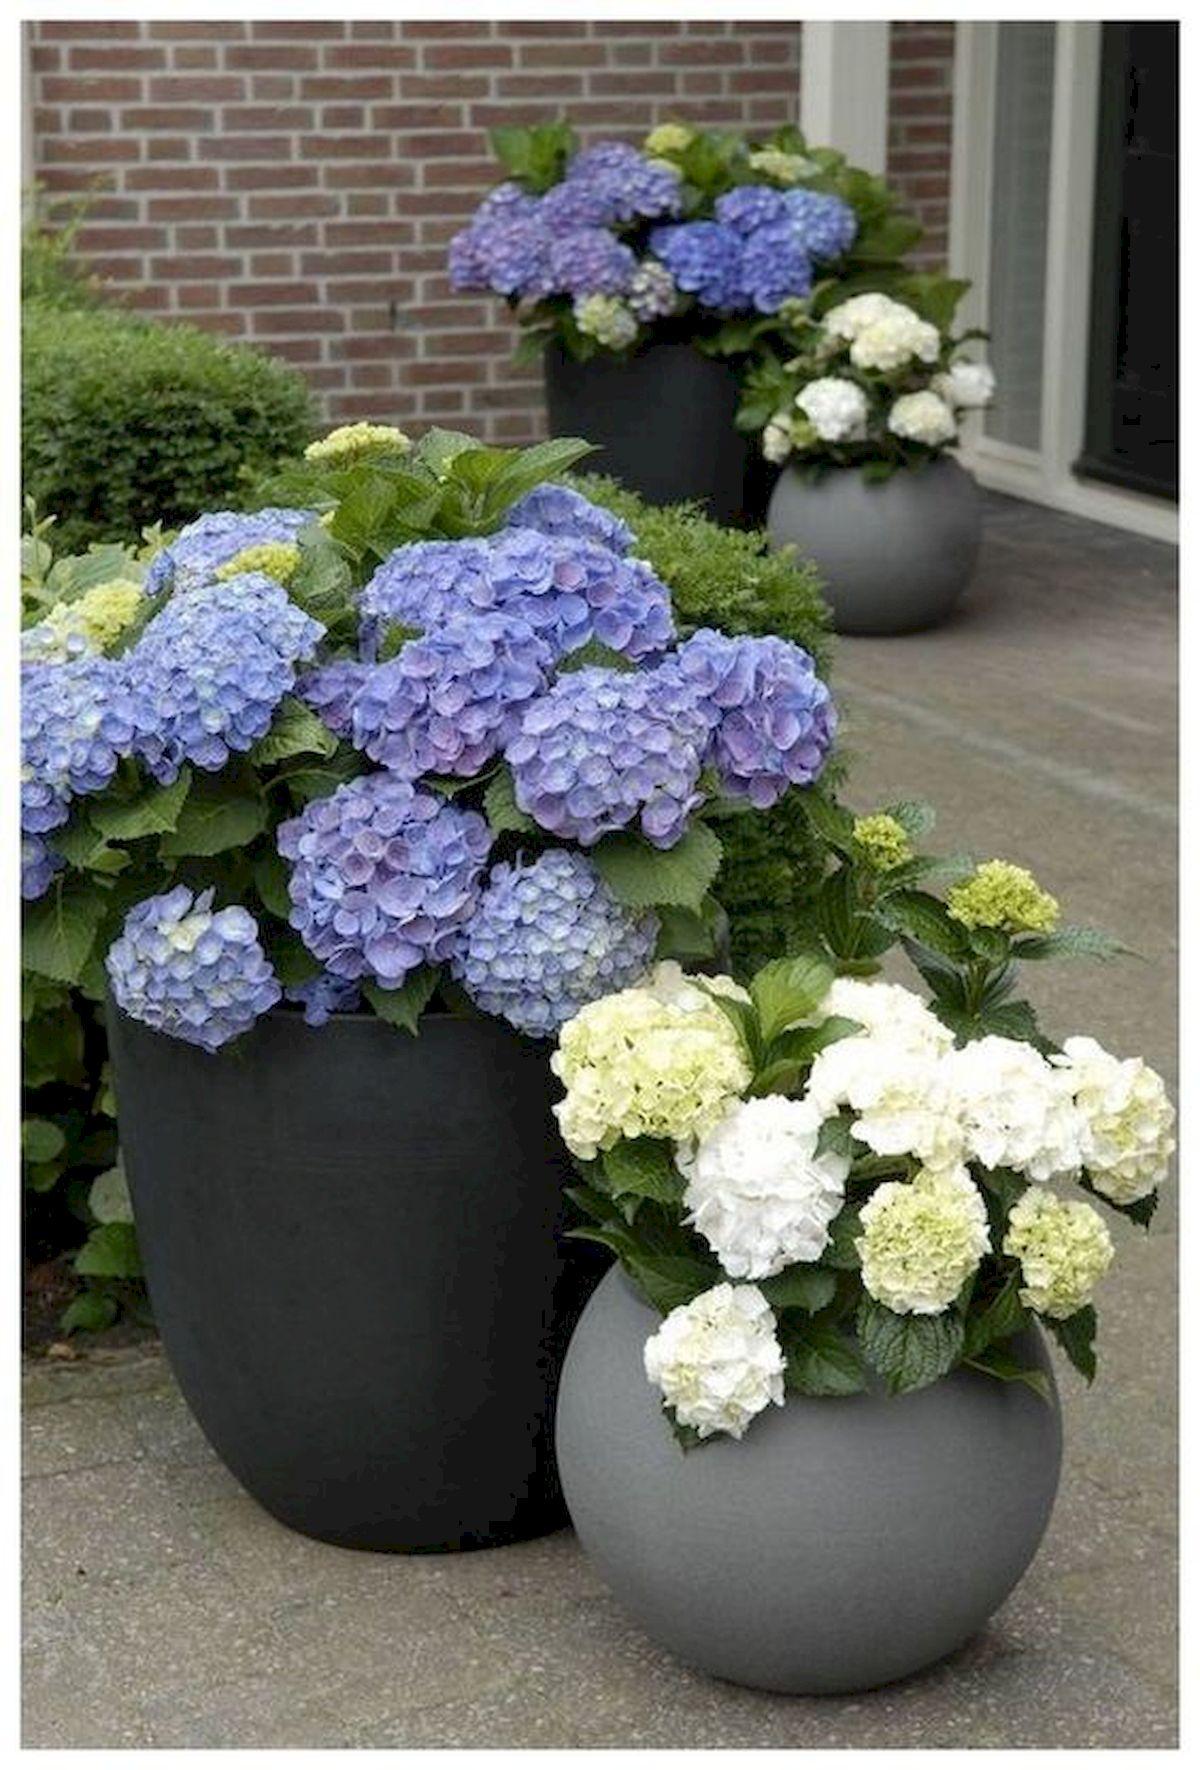 20 Fantastic DIY Planter Ideas for Your Front Porch (4)